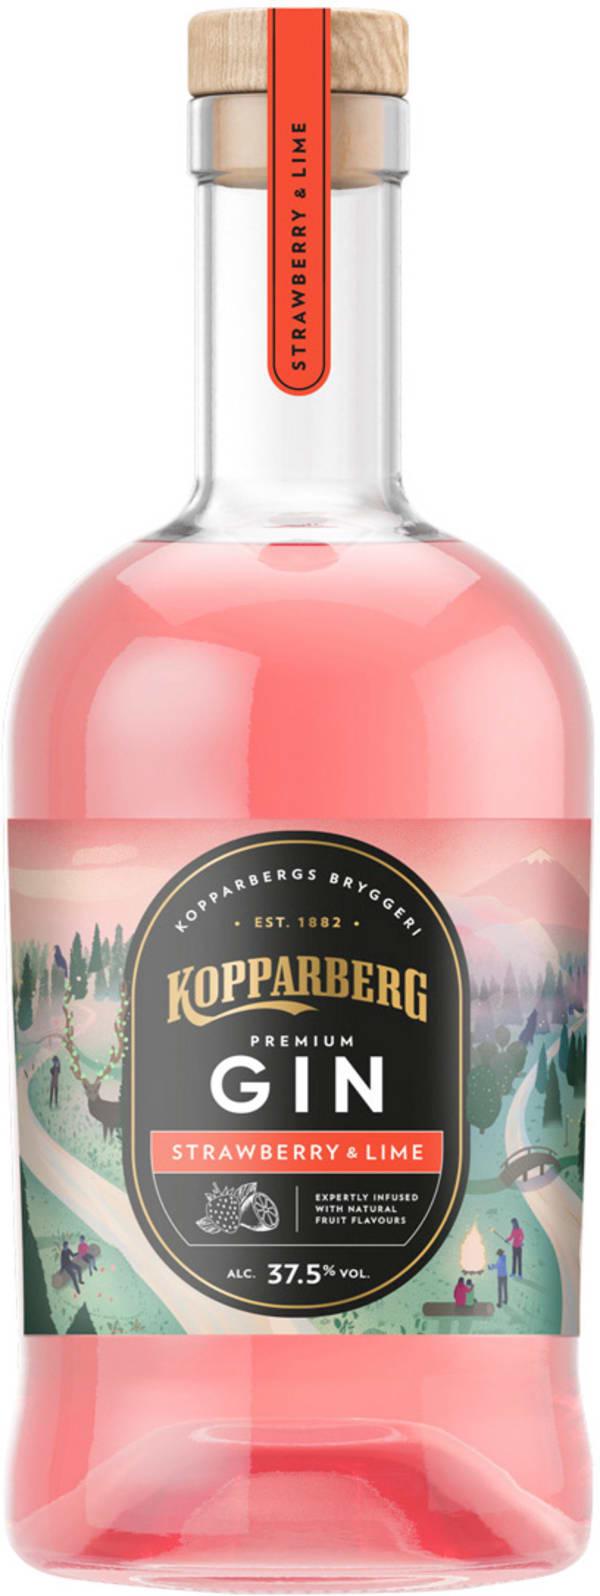 Kopparberg Premium Gin Strawberry & Lime